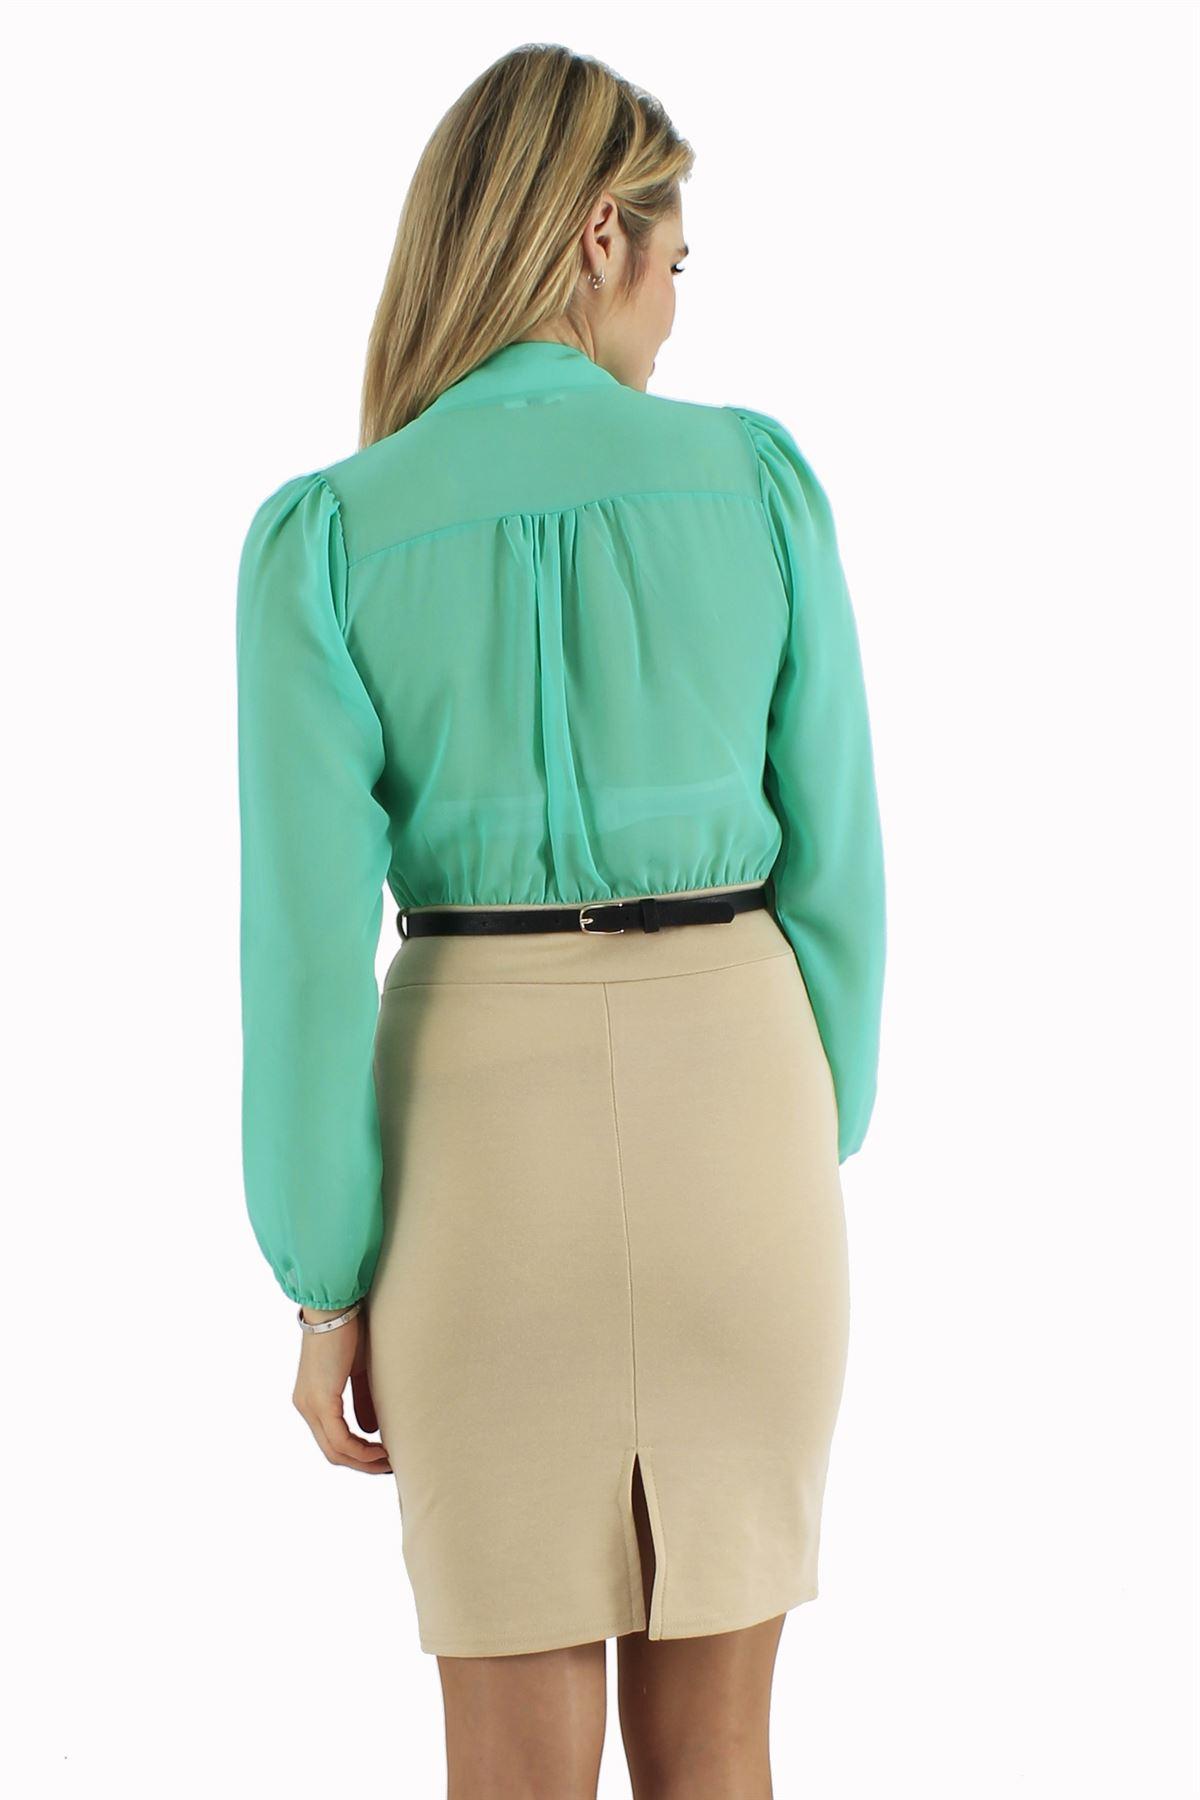 Ladies Cut Back Pencil Skirt Chiffon Gold Belated Two Tone ...